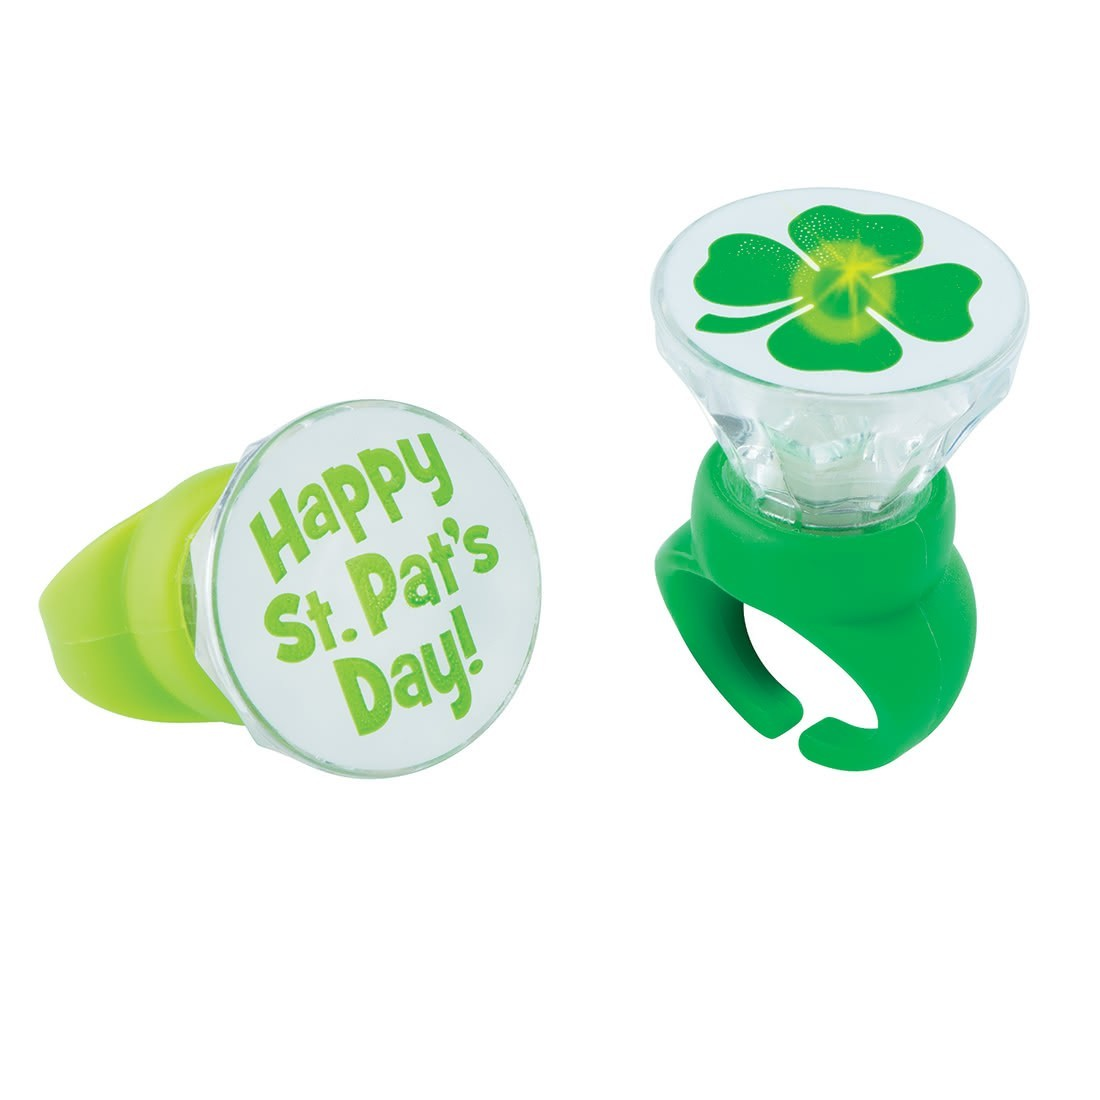 Light Up St Patricks Day Rings  [image]